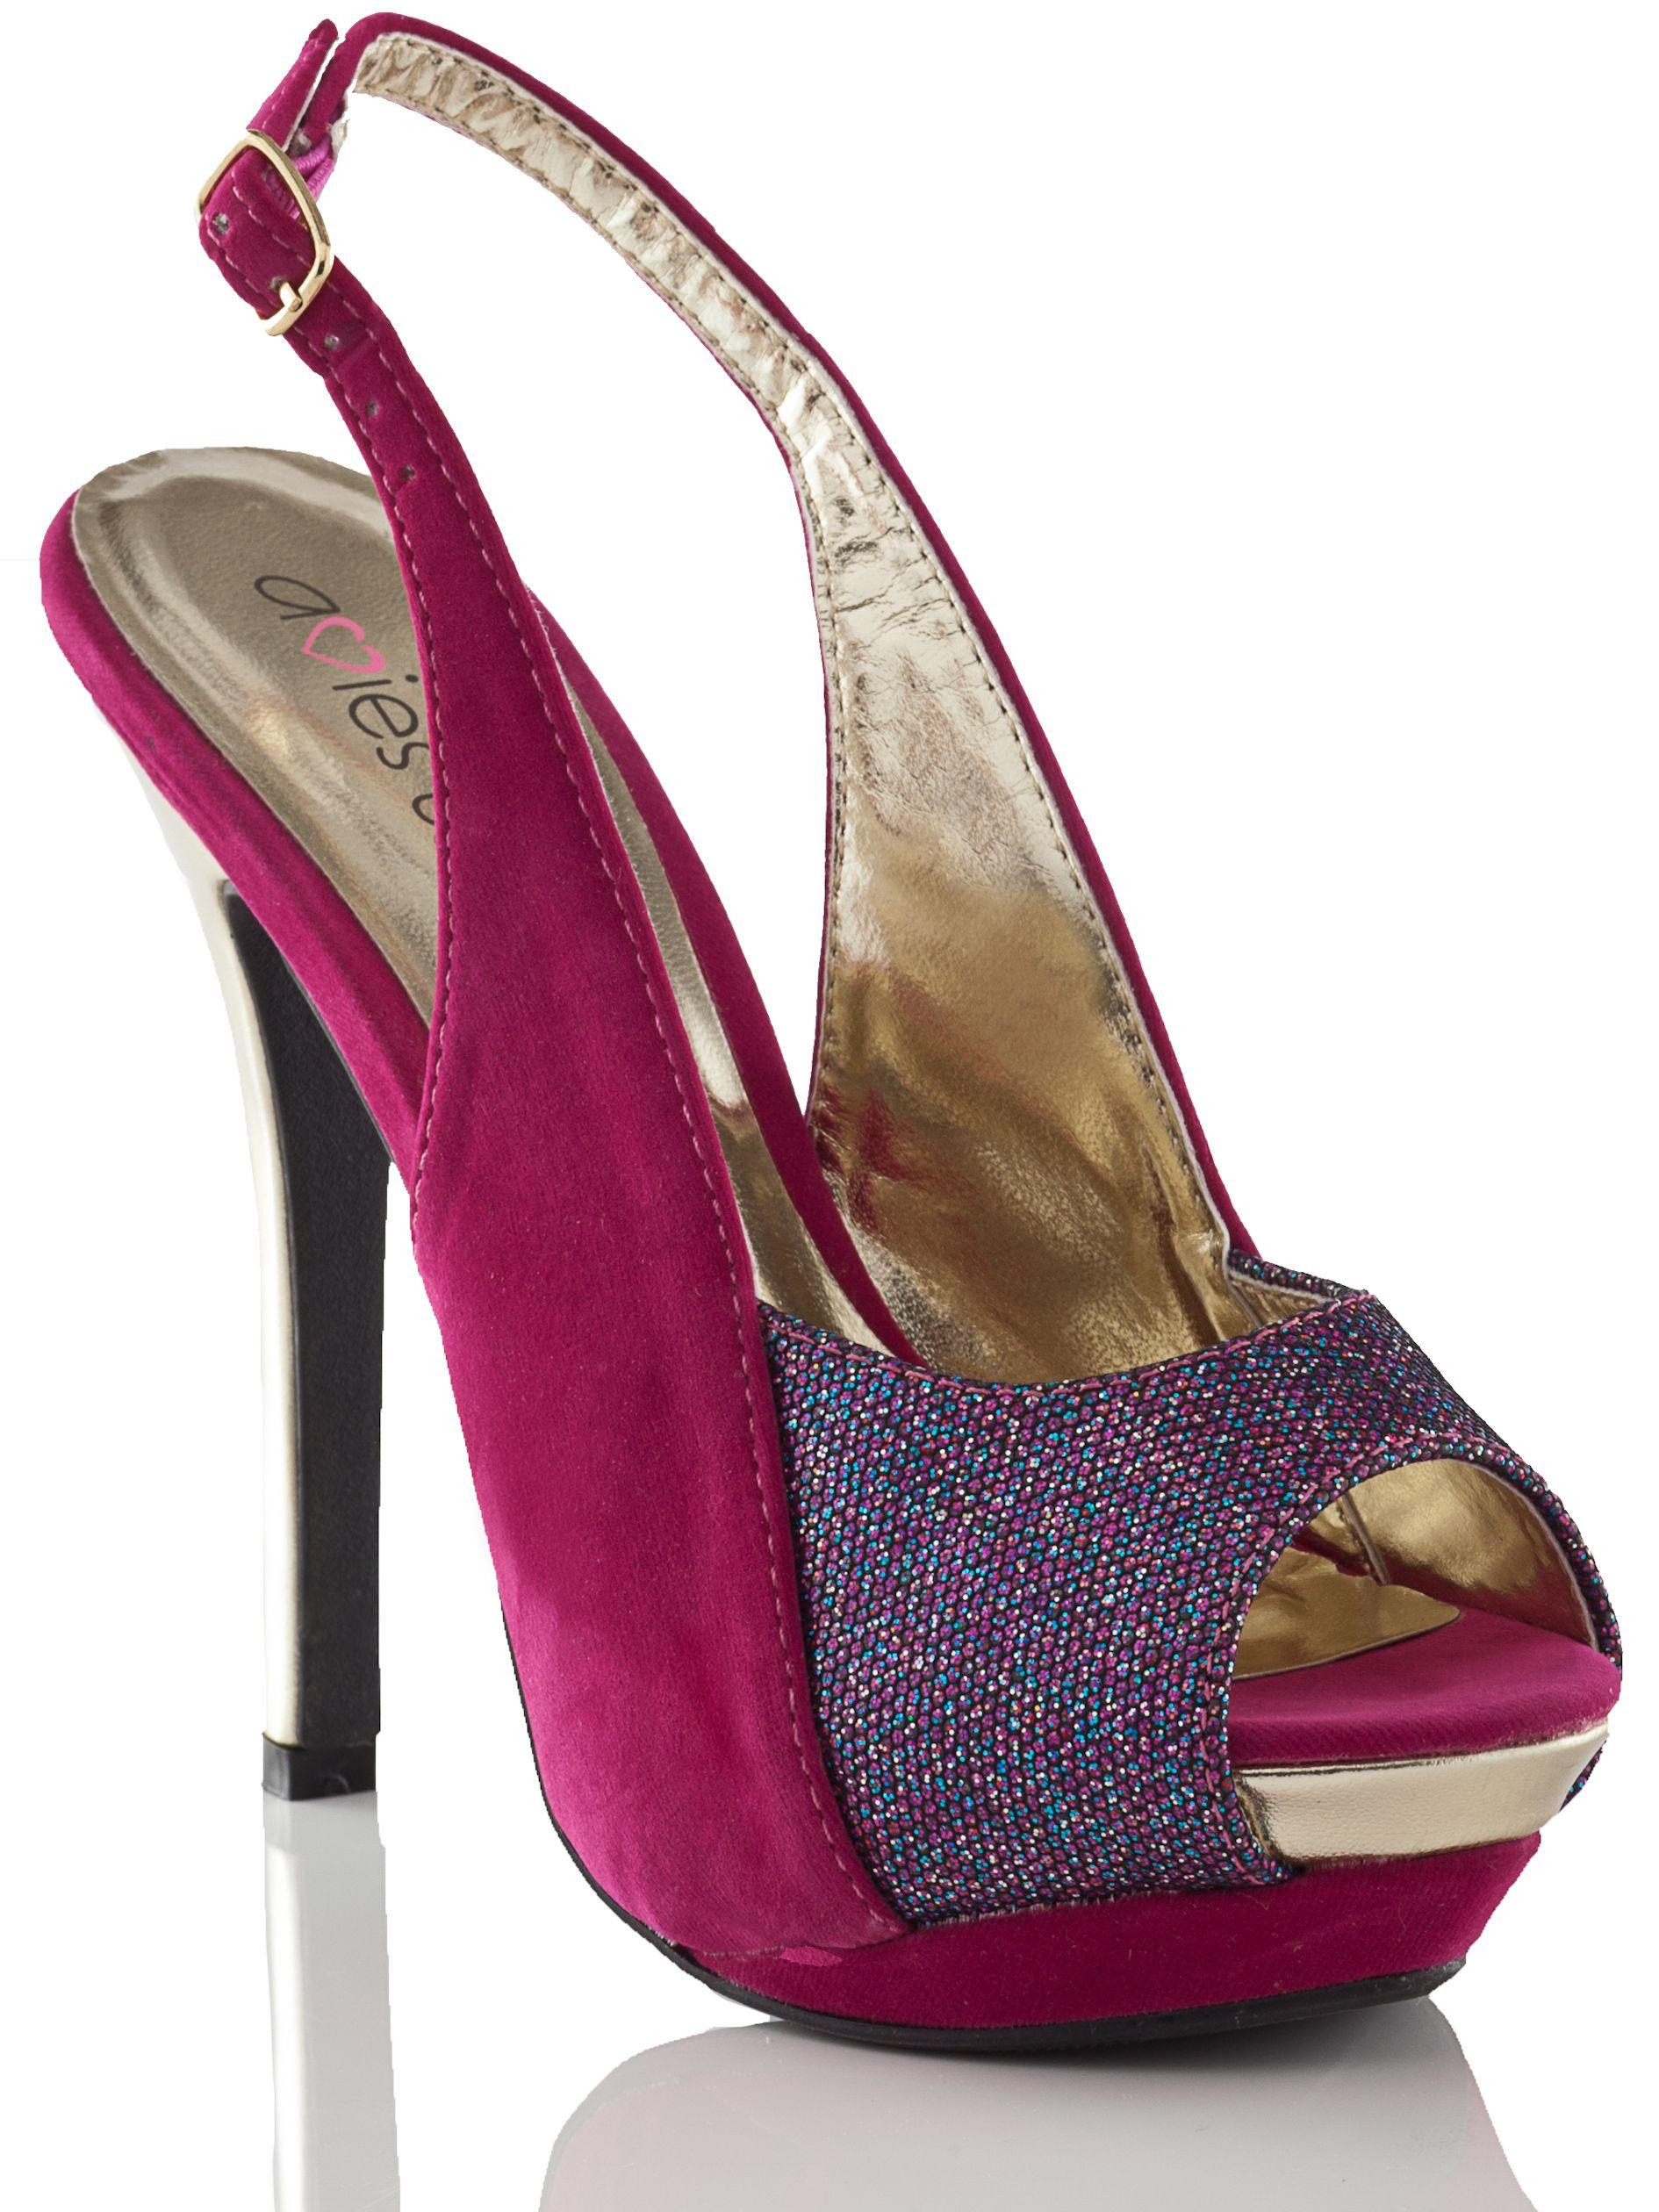 Shine in this metallic and glitter Lia heels.